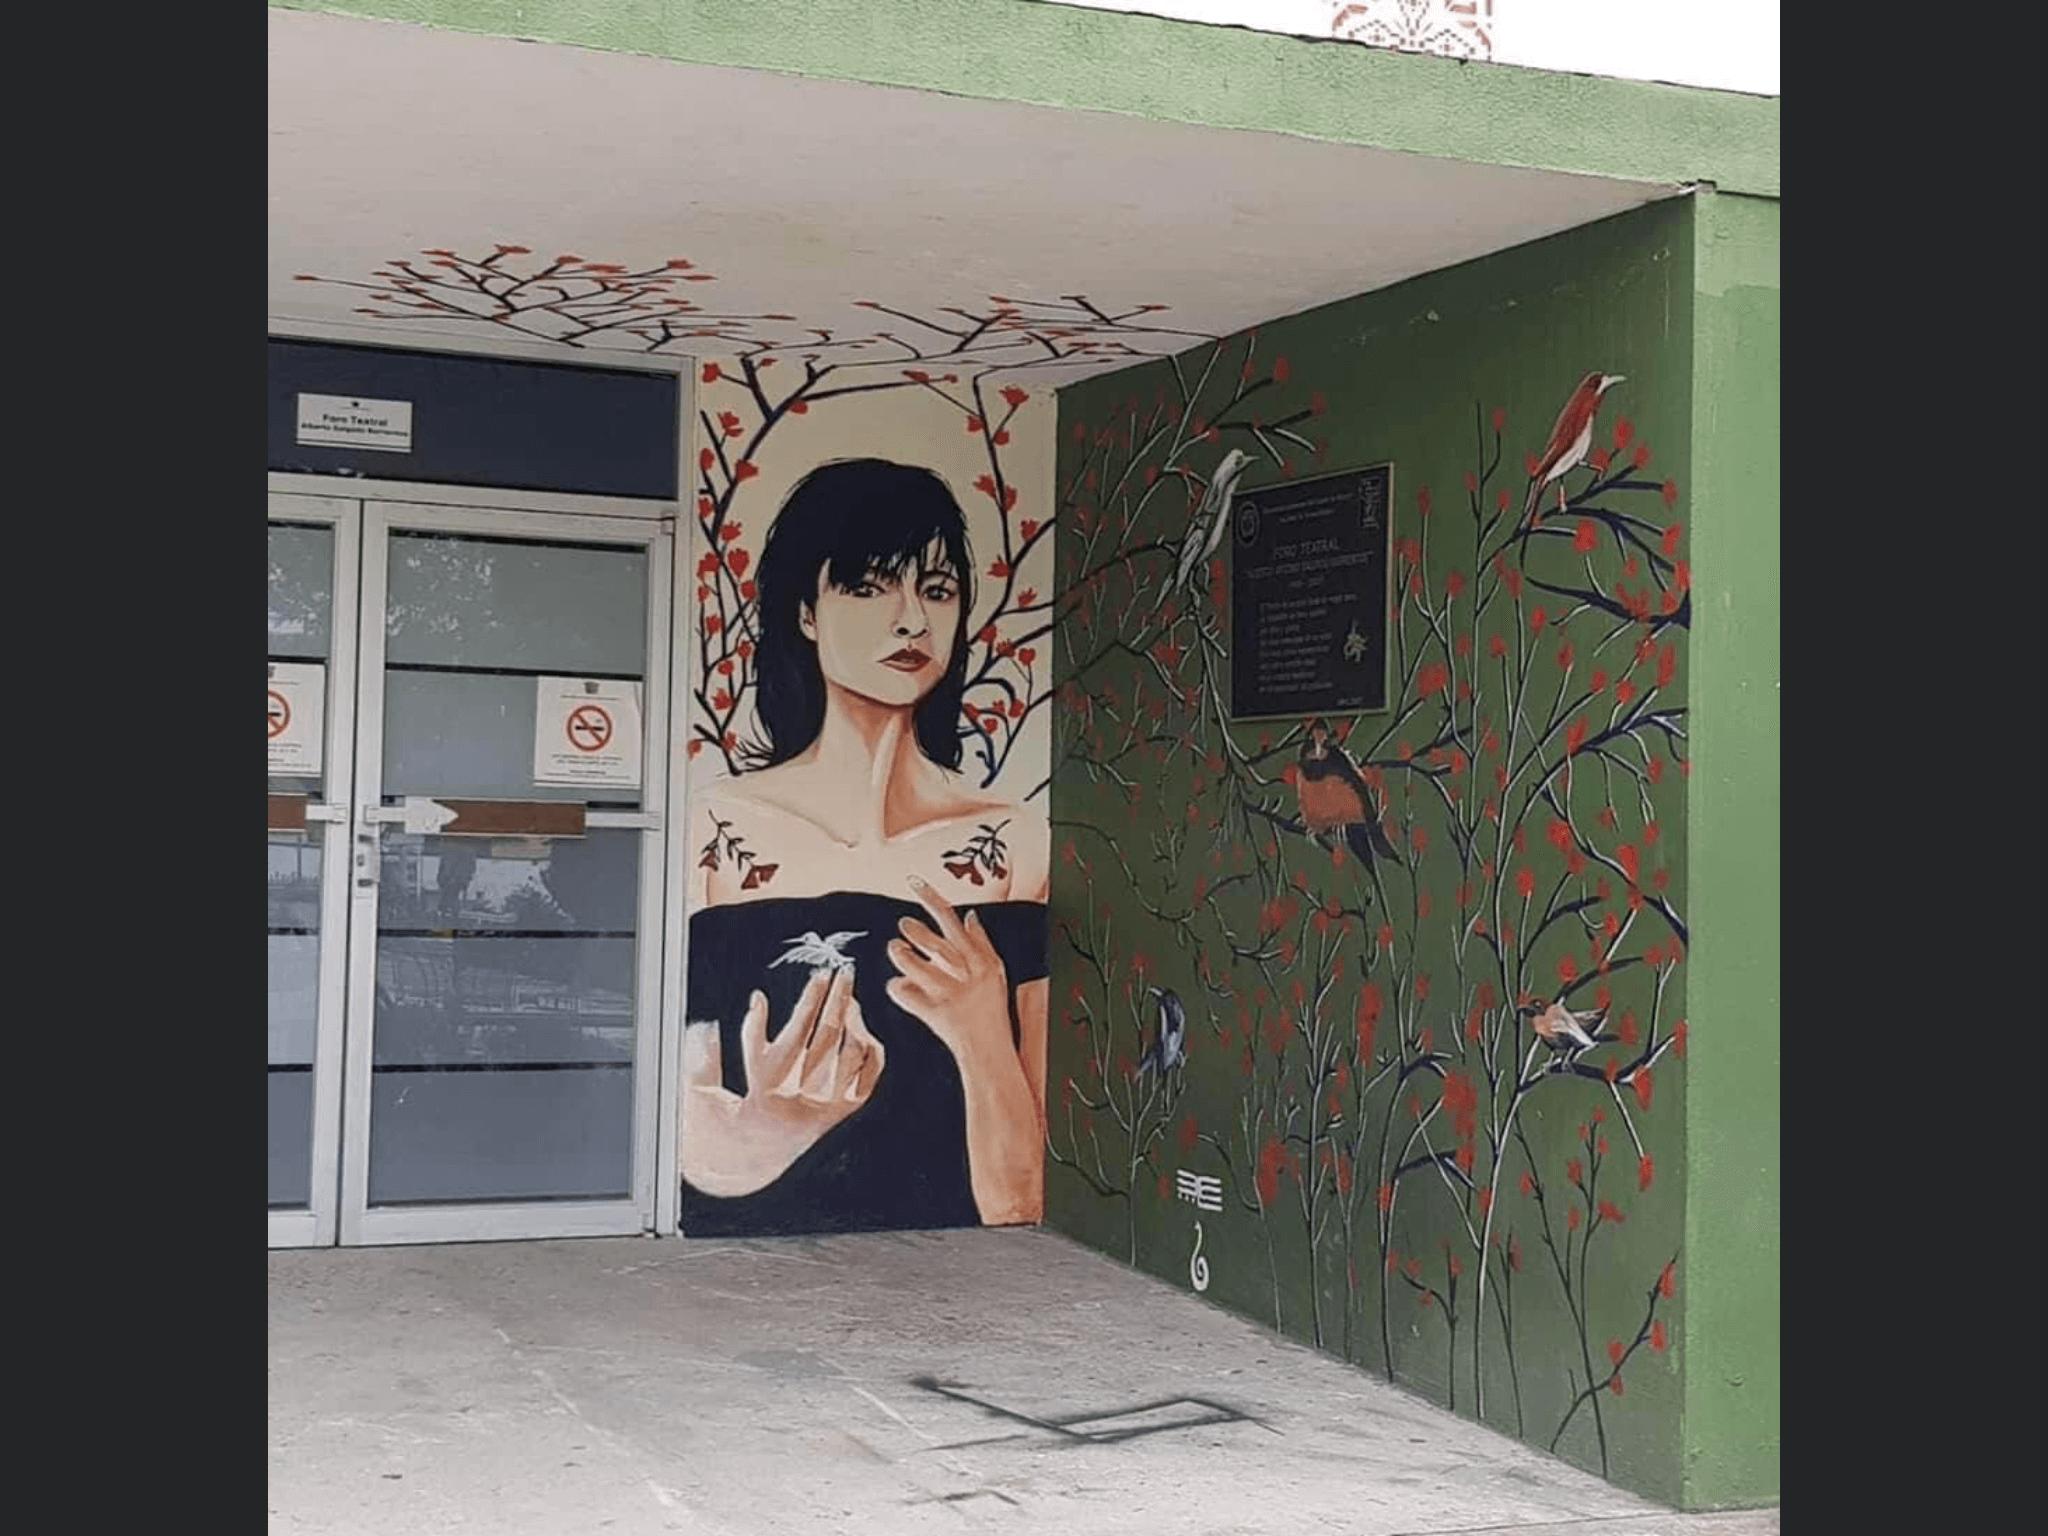 A encuesta, murales en Humanidades de UAEM